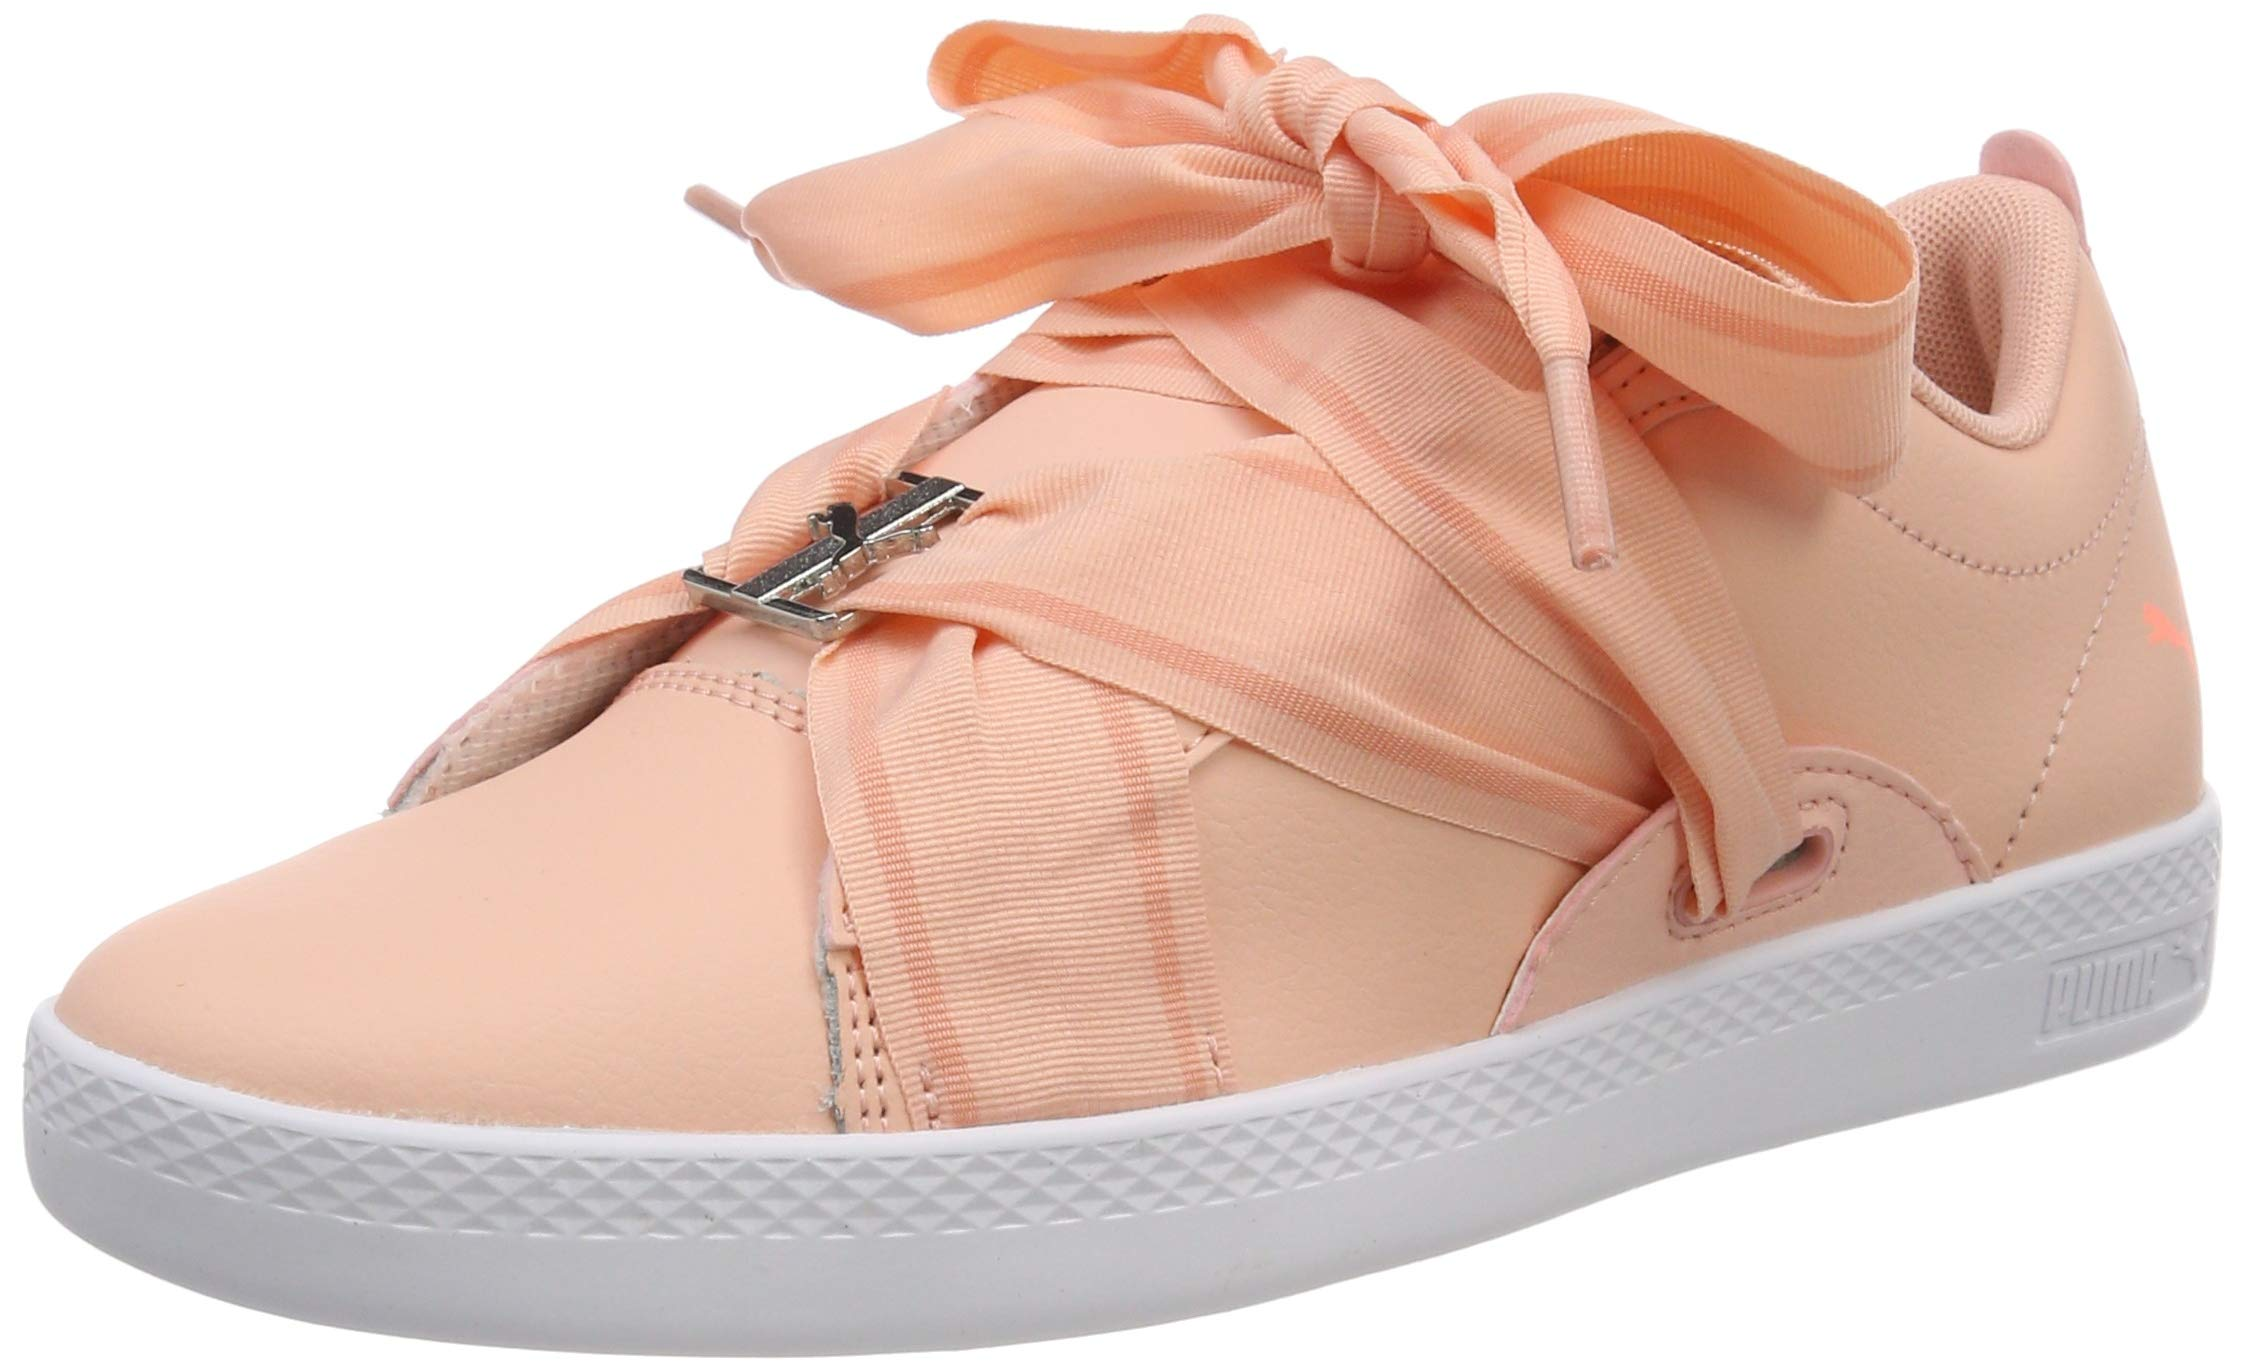 BuckleSneakers Bud 5 Wns Basses Puma FemmeRose bright Peach Smash Eu White37 xoerdBQCWE